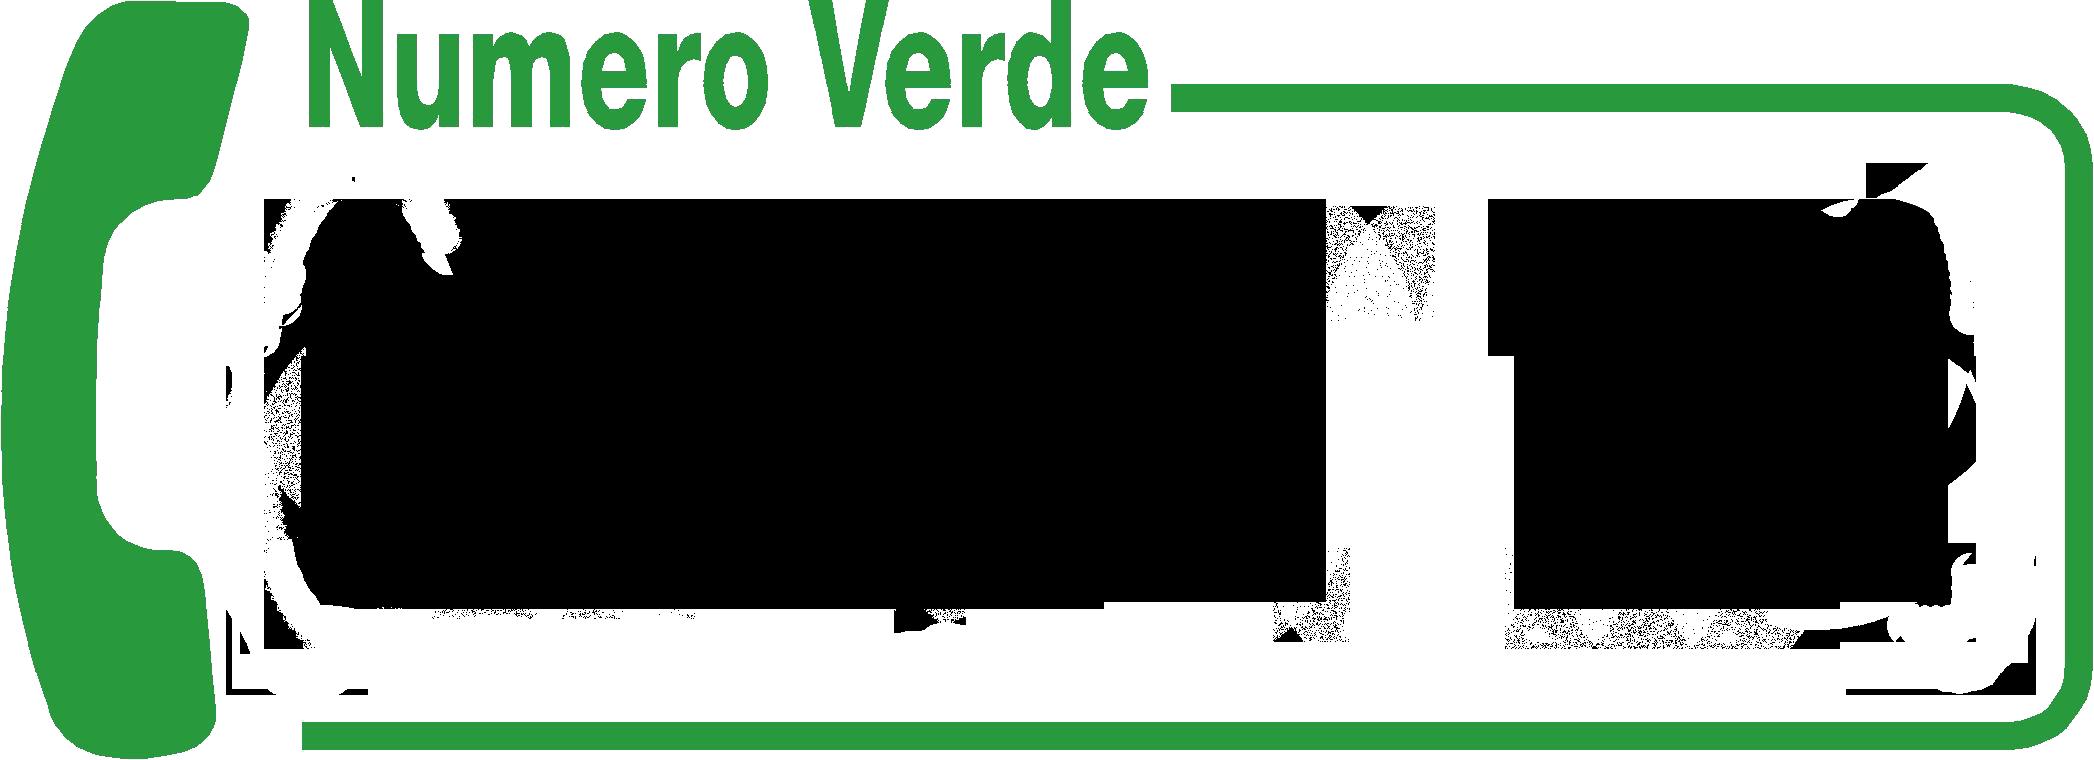 Aemilia tradux - Numero verde poltronesofa ...